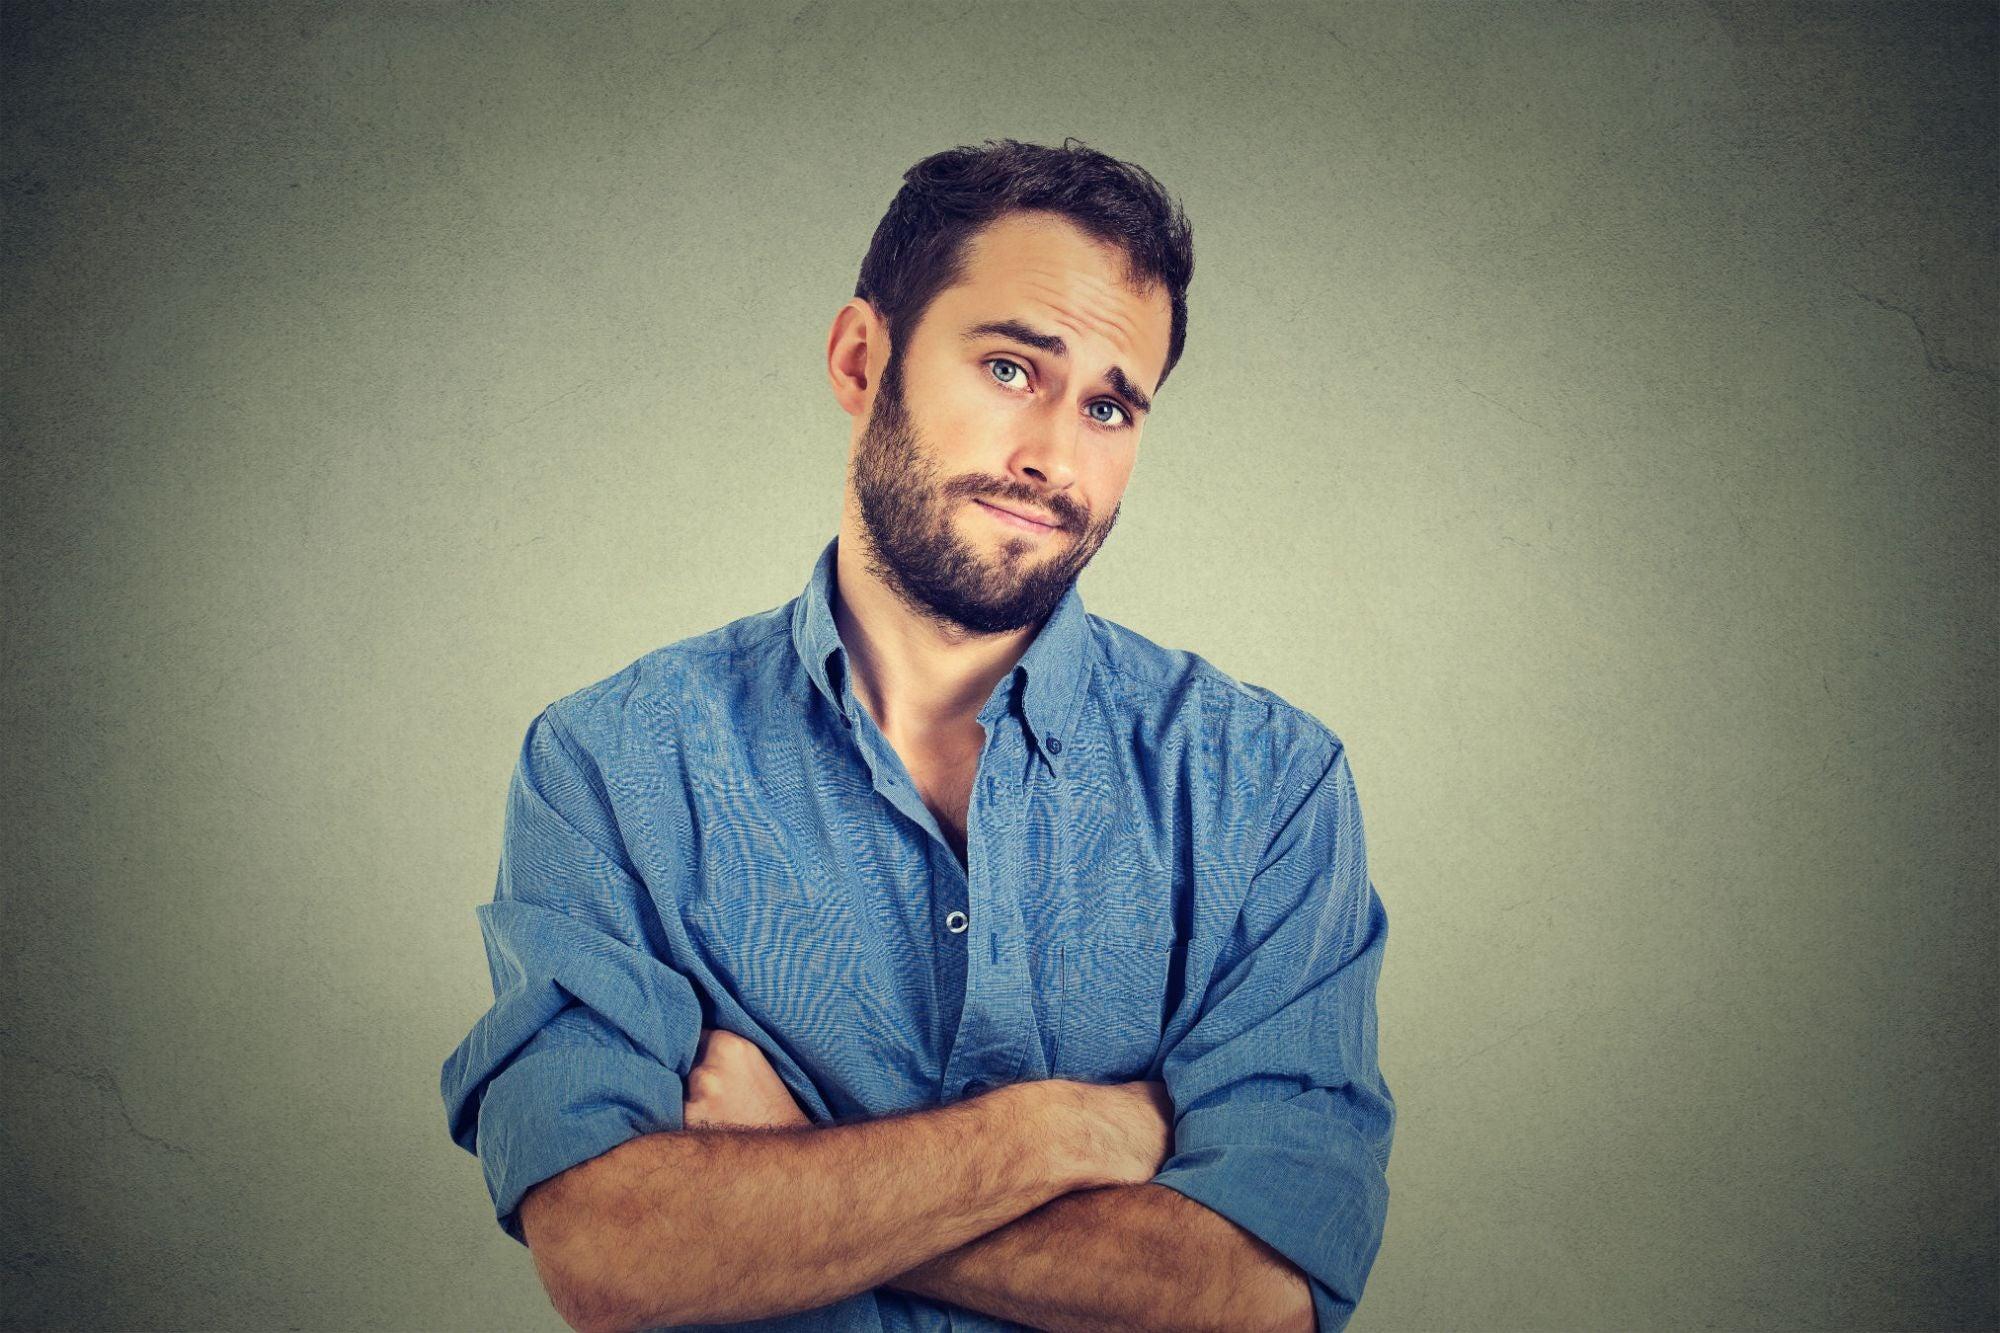 entrepreneur.com - John Rampton - 12 frases pasivo-agresivas que destruyen tu negocio